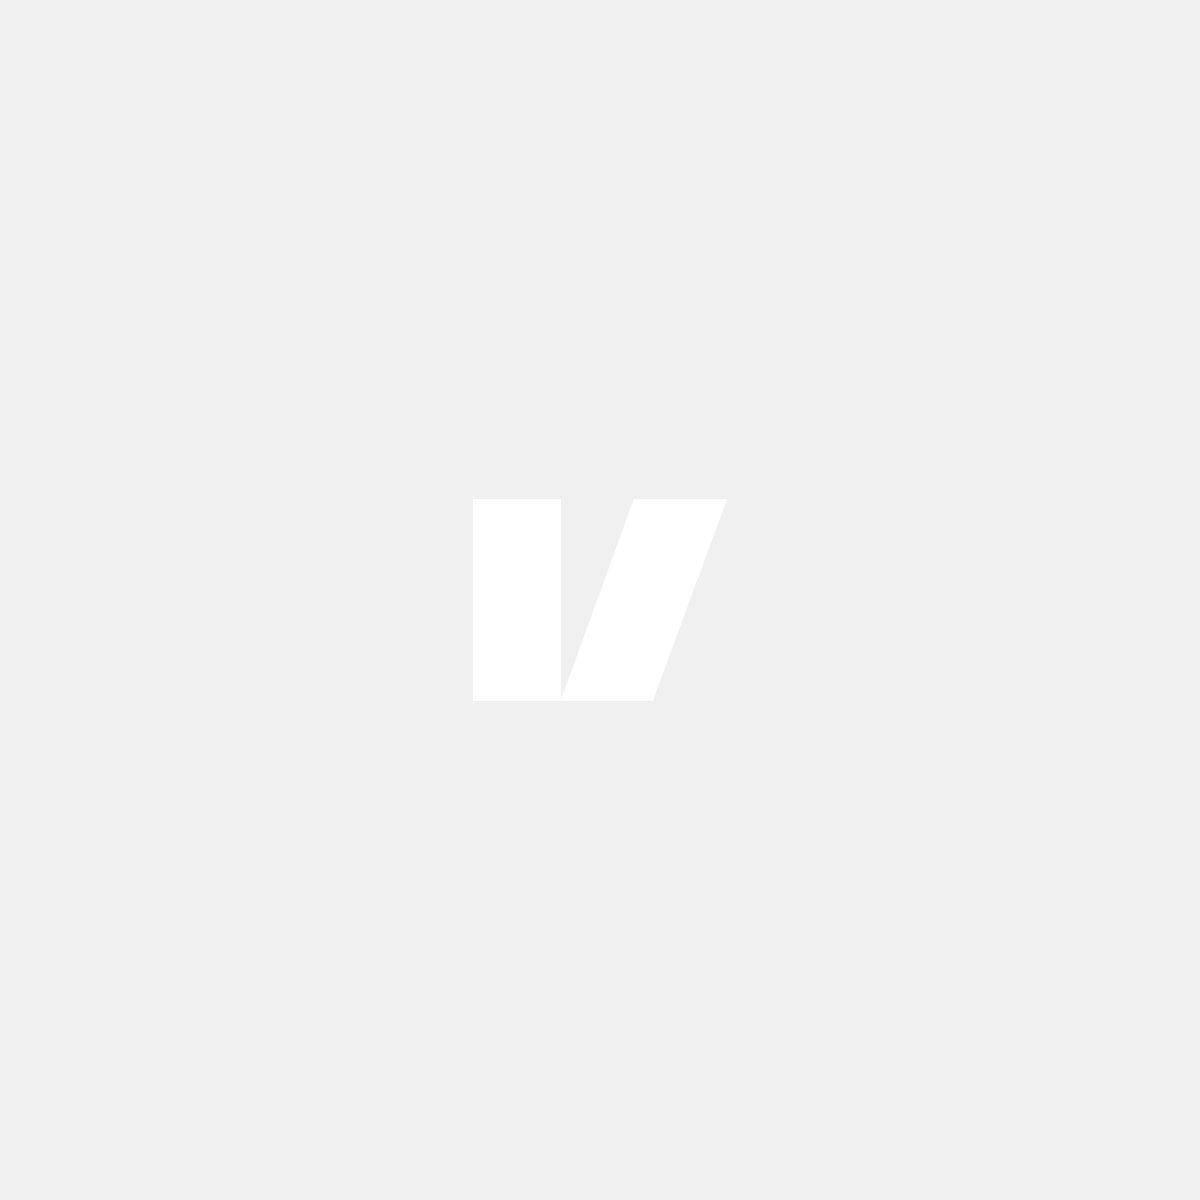 Tygmattor till Volvo XC90 03-15, mörkgrå